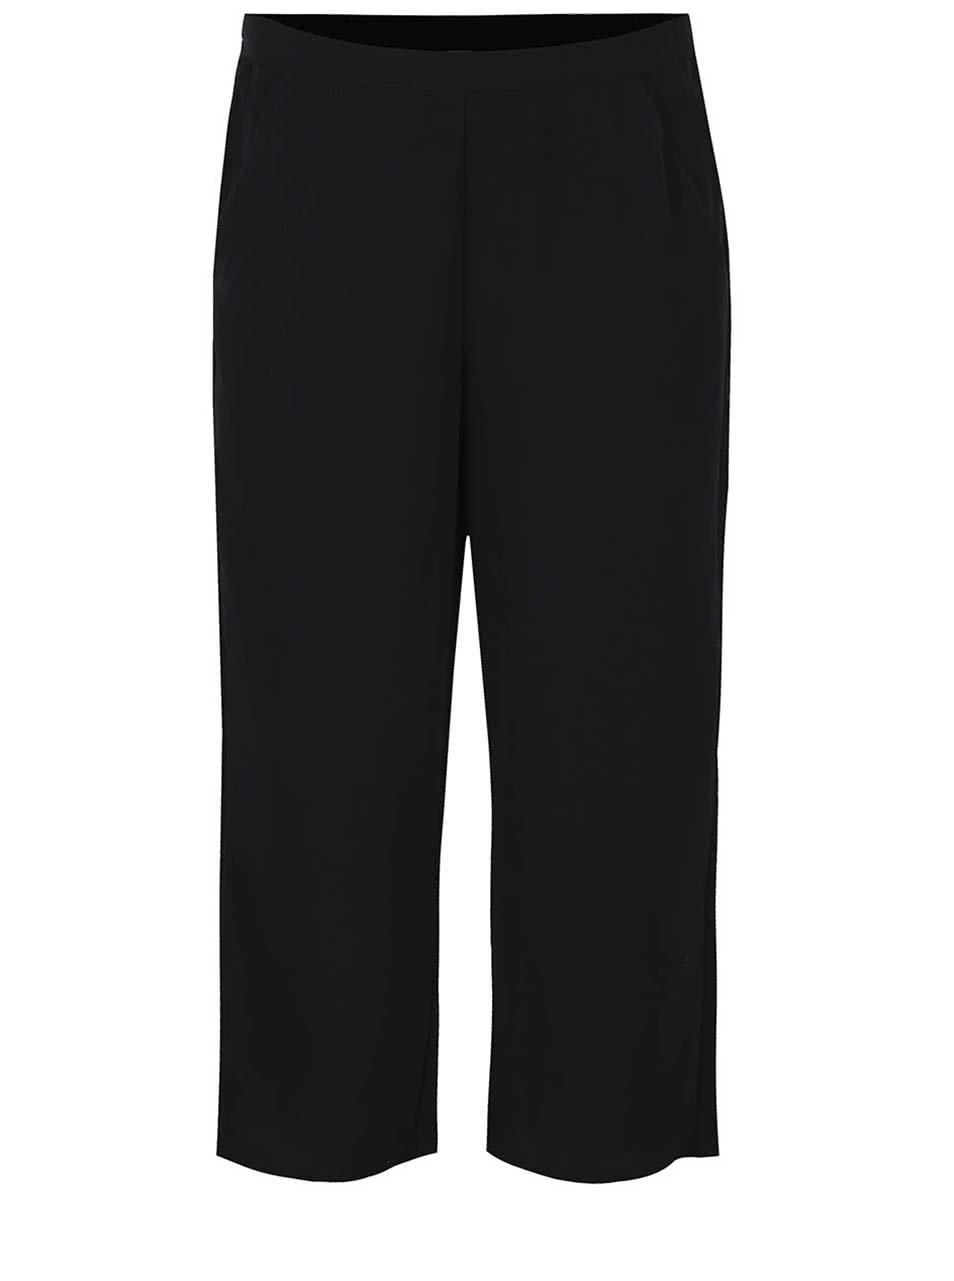 Černé culottes kalhoty VERO MODA Maggie